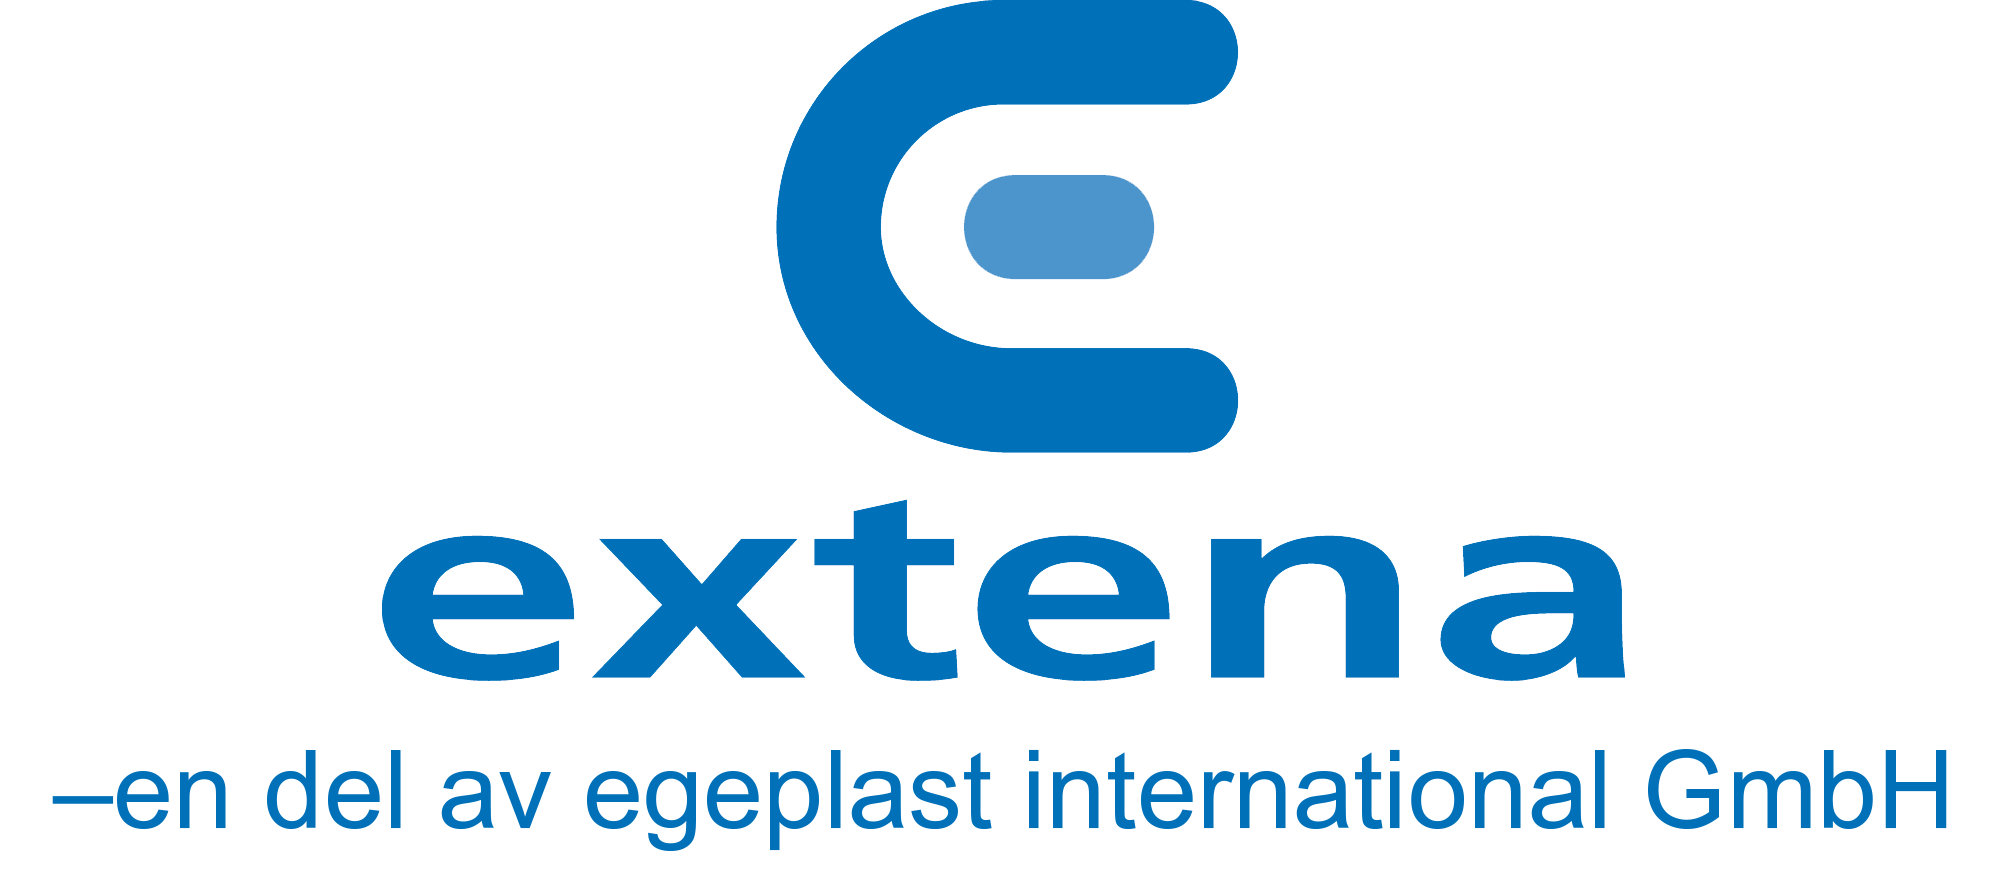 Exena Finland